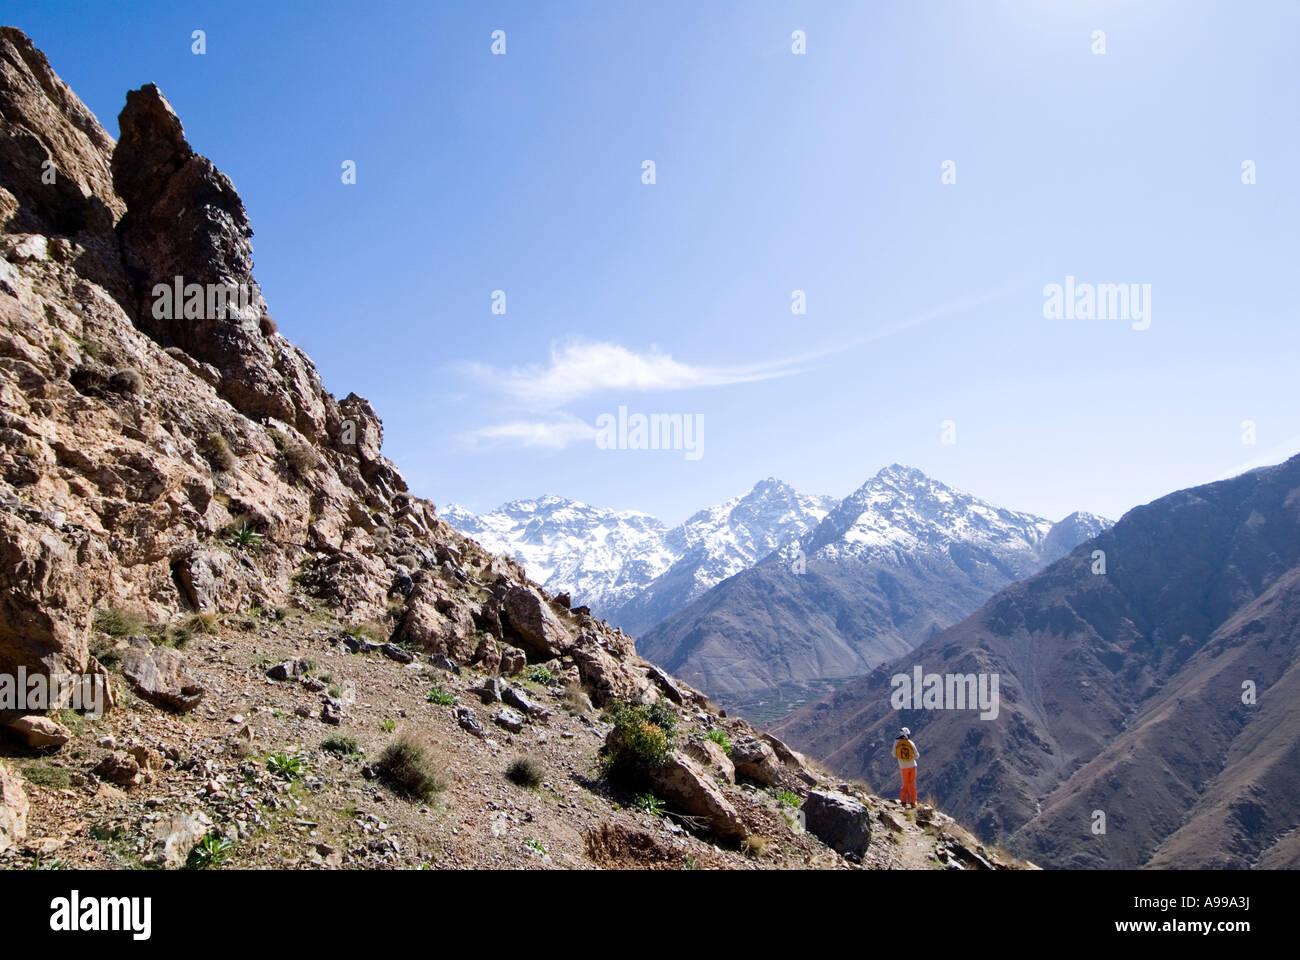 Trekker overlooking the vast Mizane Valley towards the snowy Toubkal mountain range of the High Atlas Mountains - Stock Image